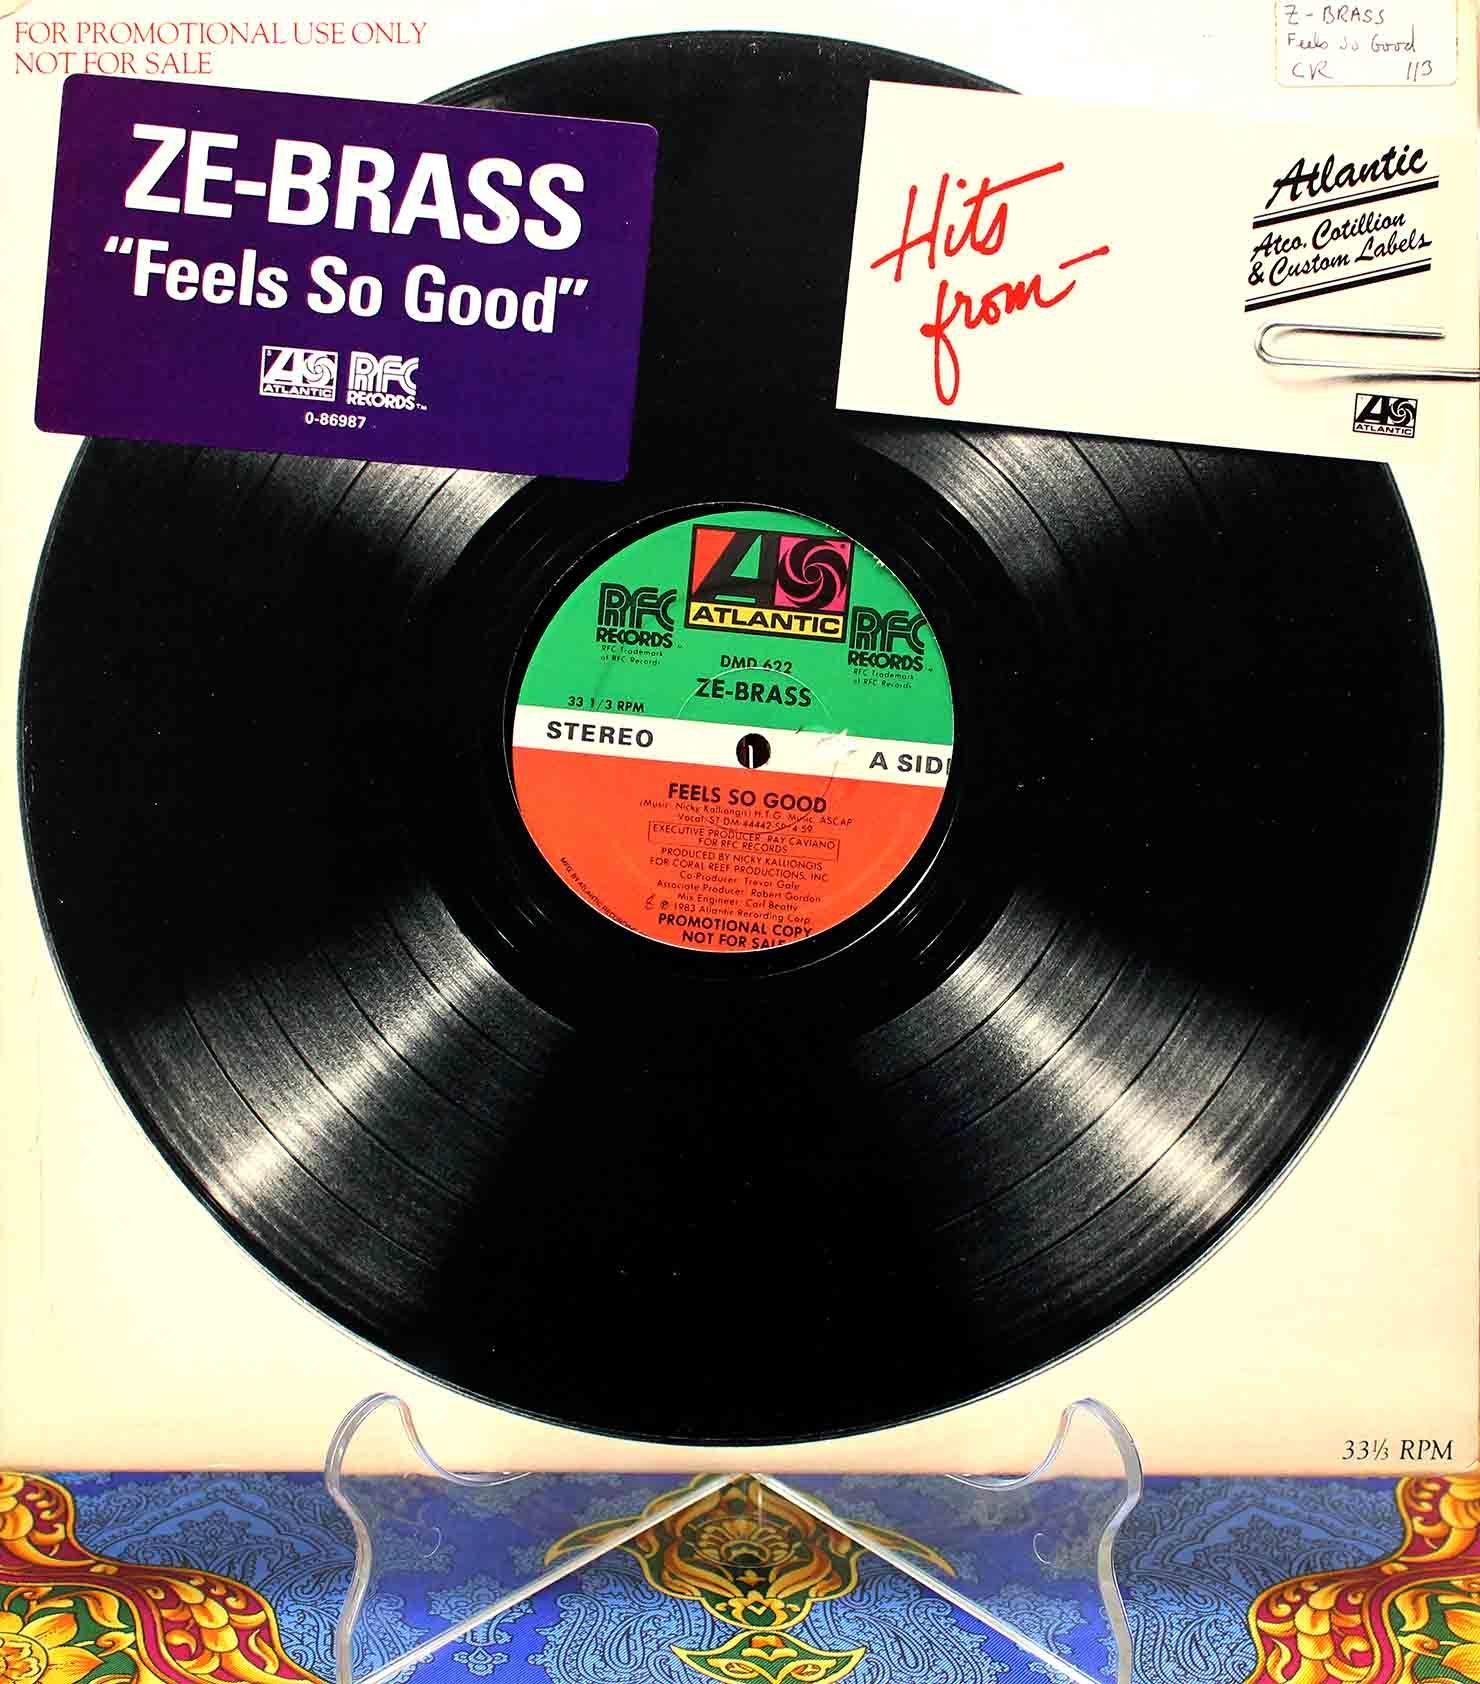 Ze-Brass – Feels So Good 01